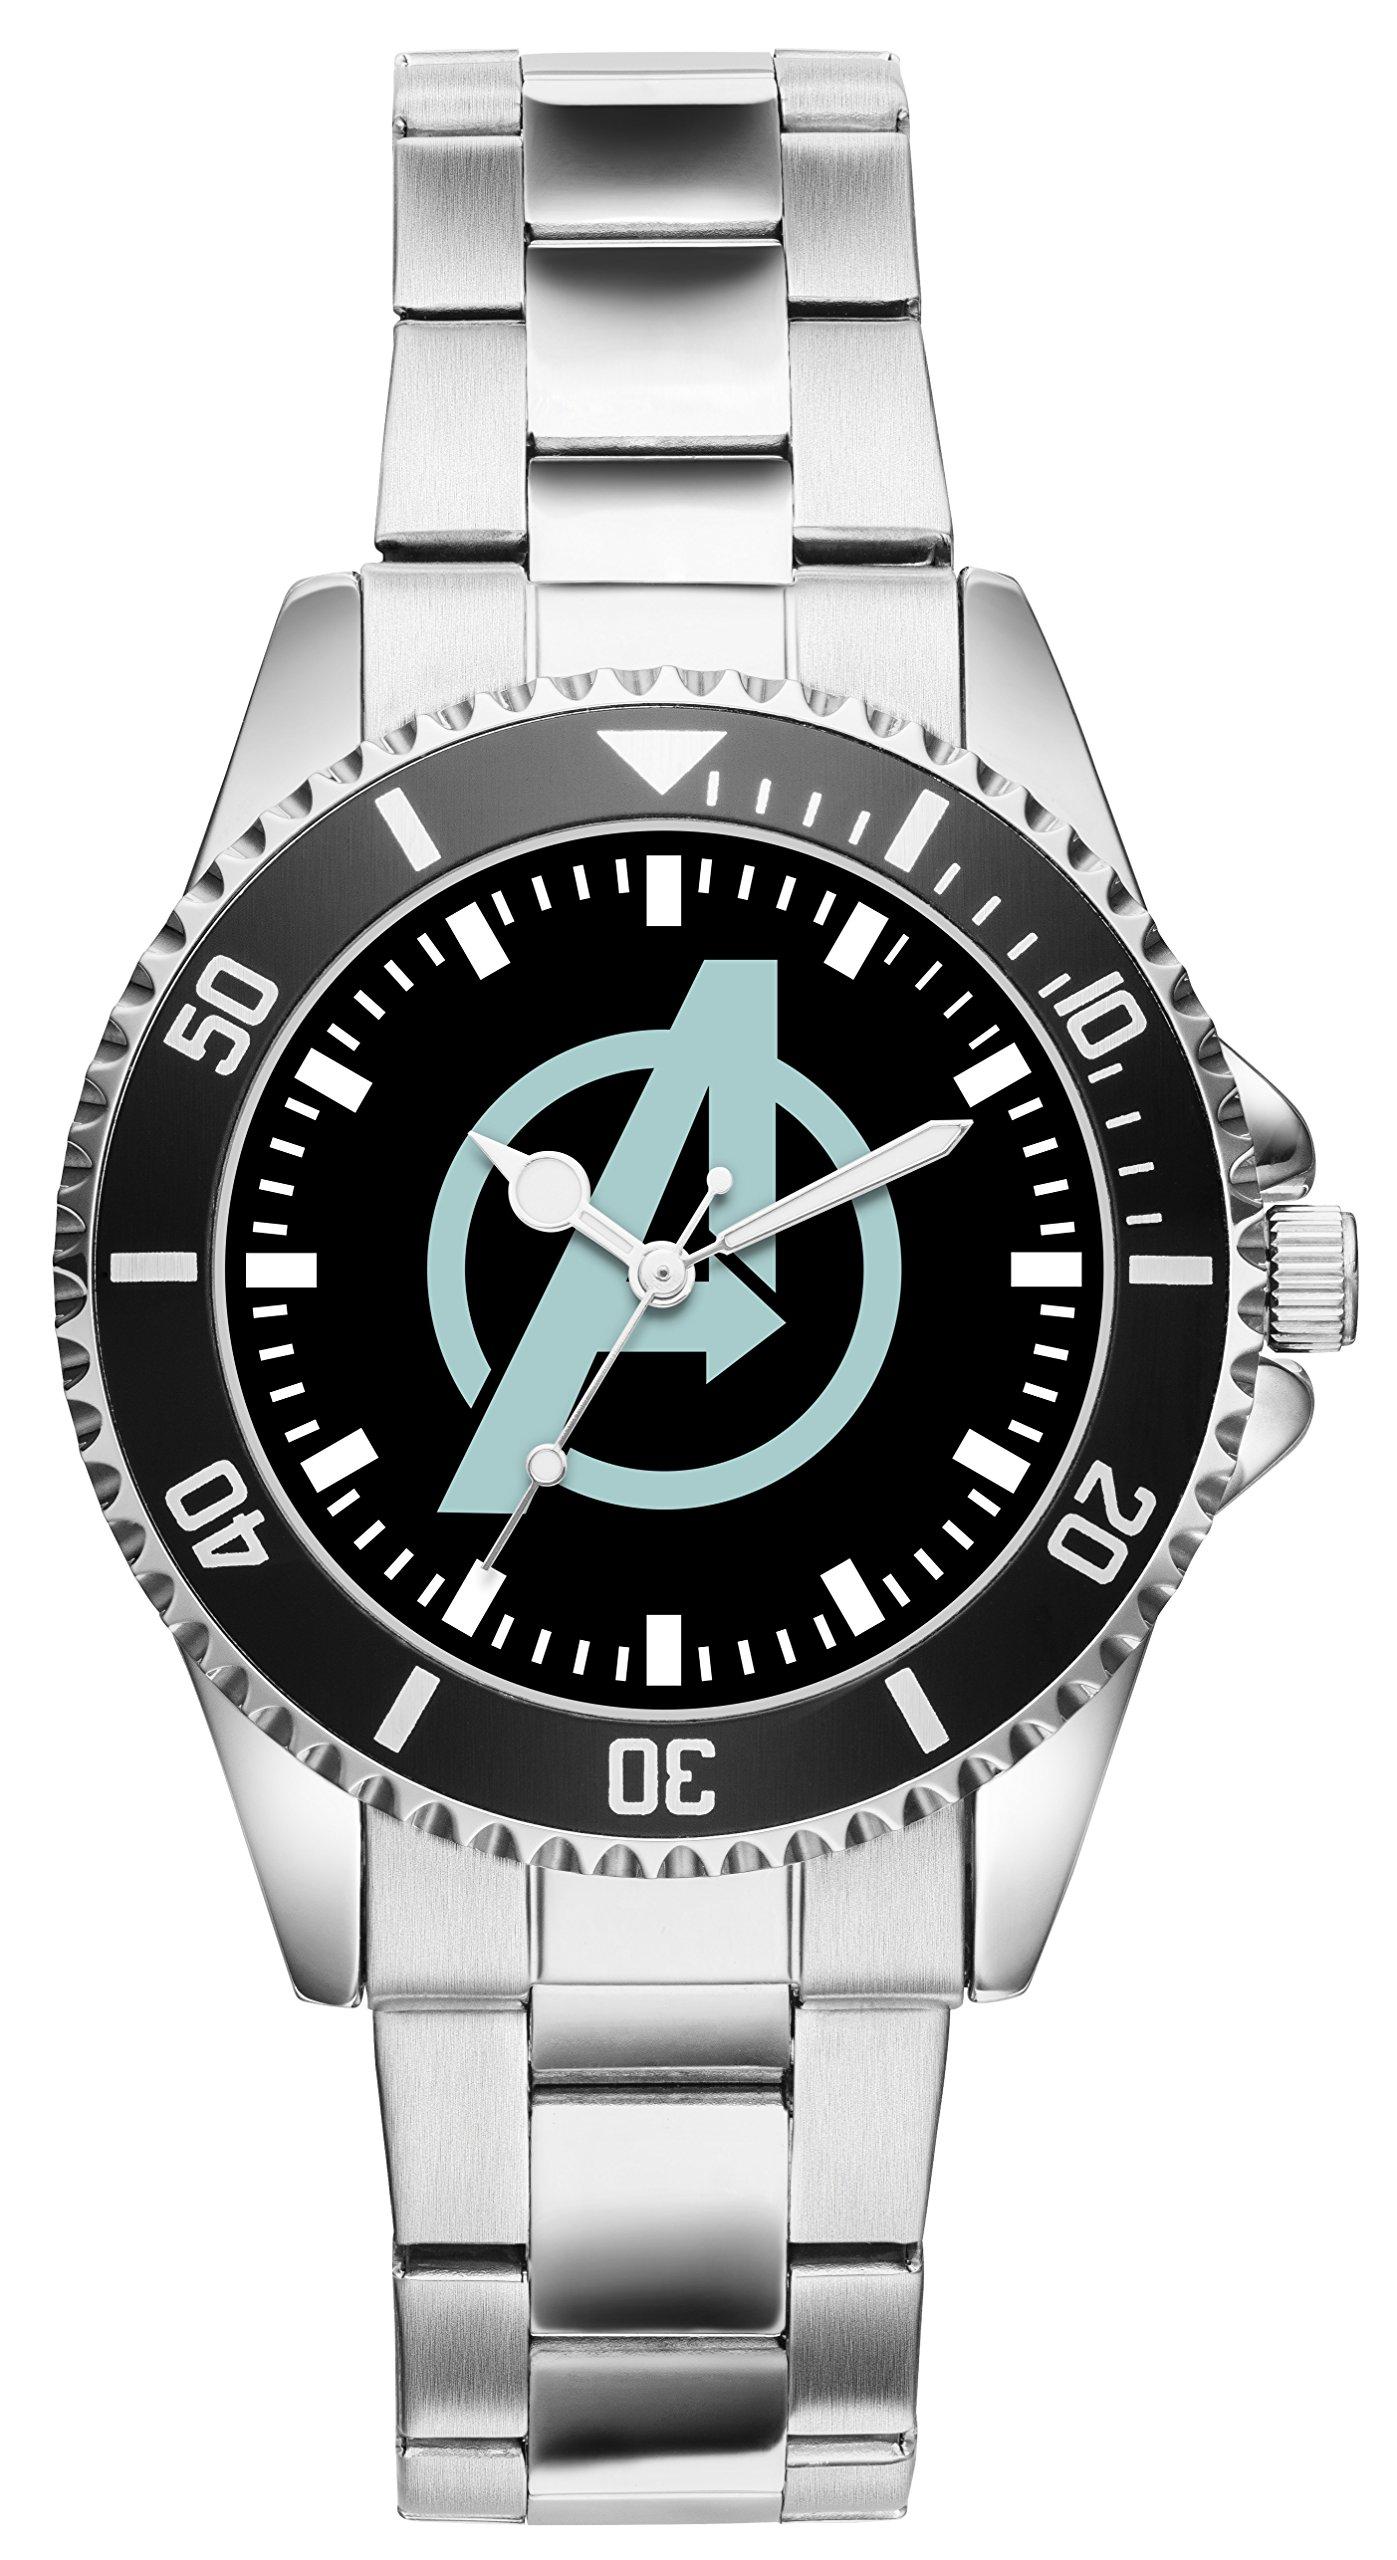 The-Avengers-Geschenk-Artikel-Idee-Fan-Uhr-1662